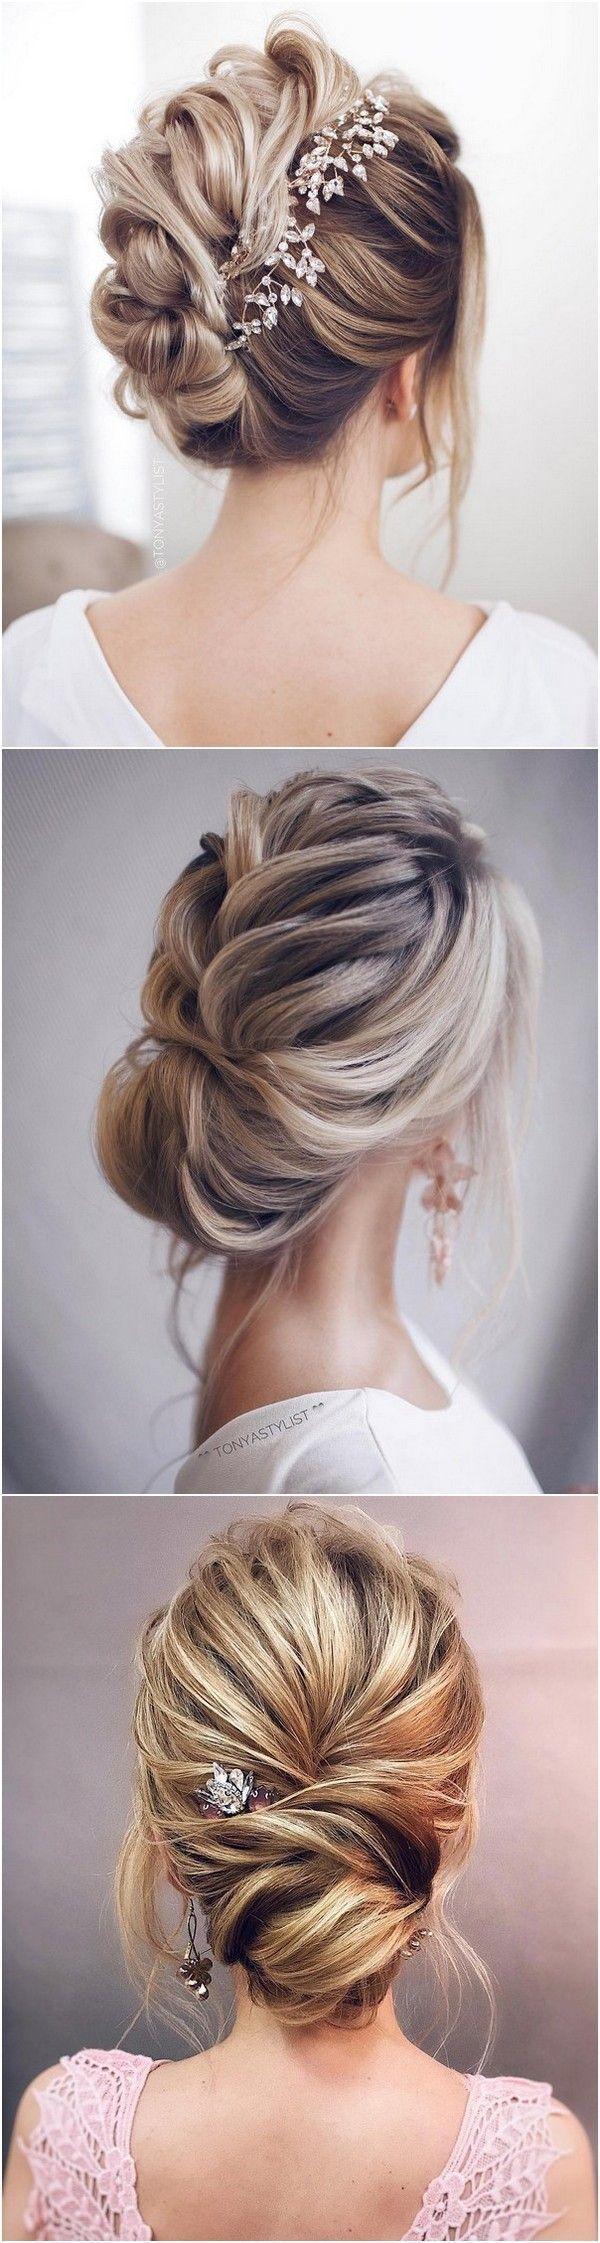 so pretty updo wedding hairstyles from tonyapushkareva hair